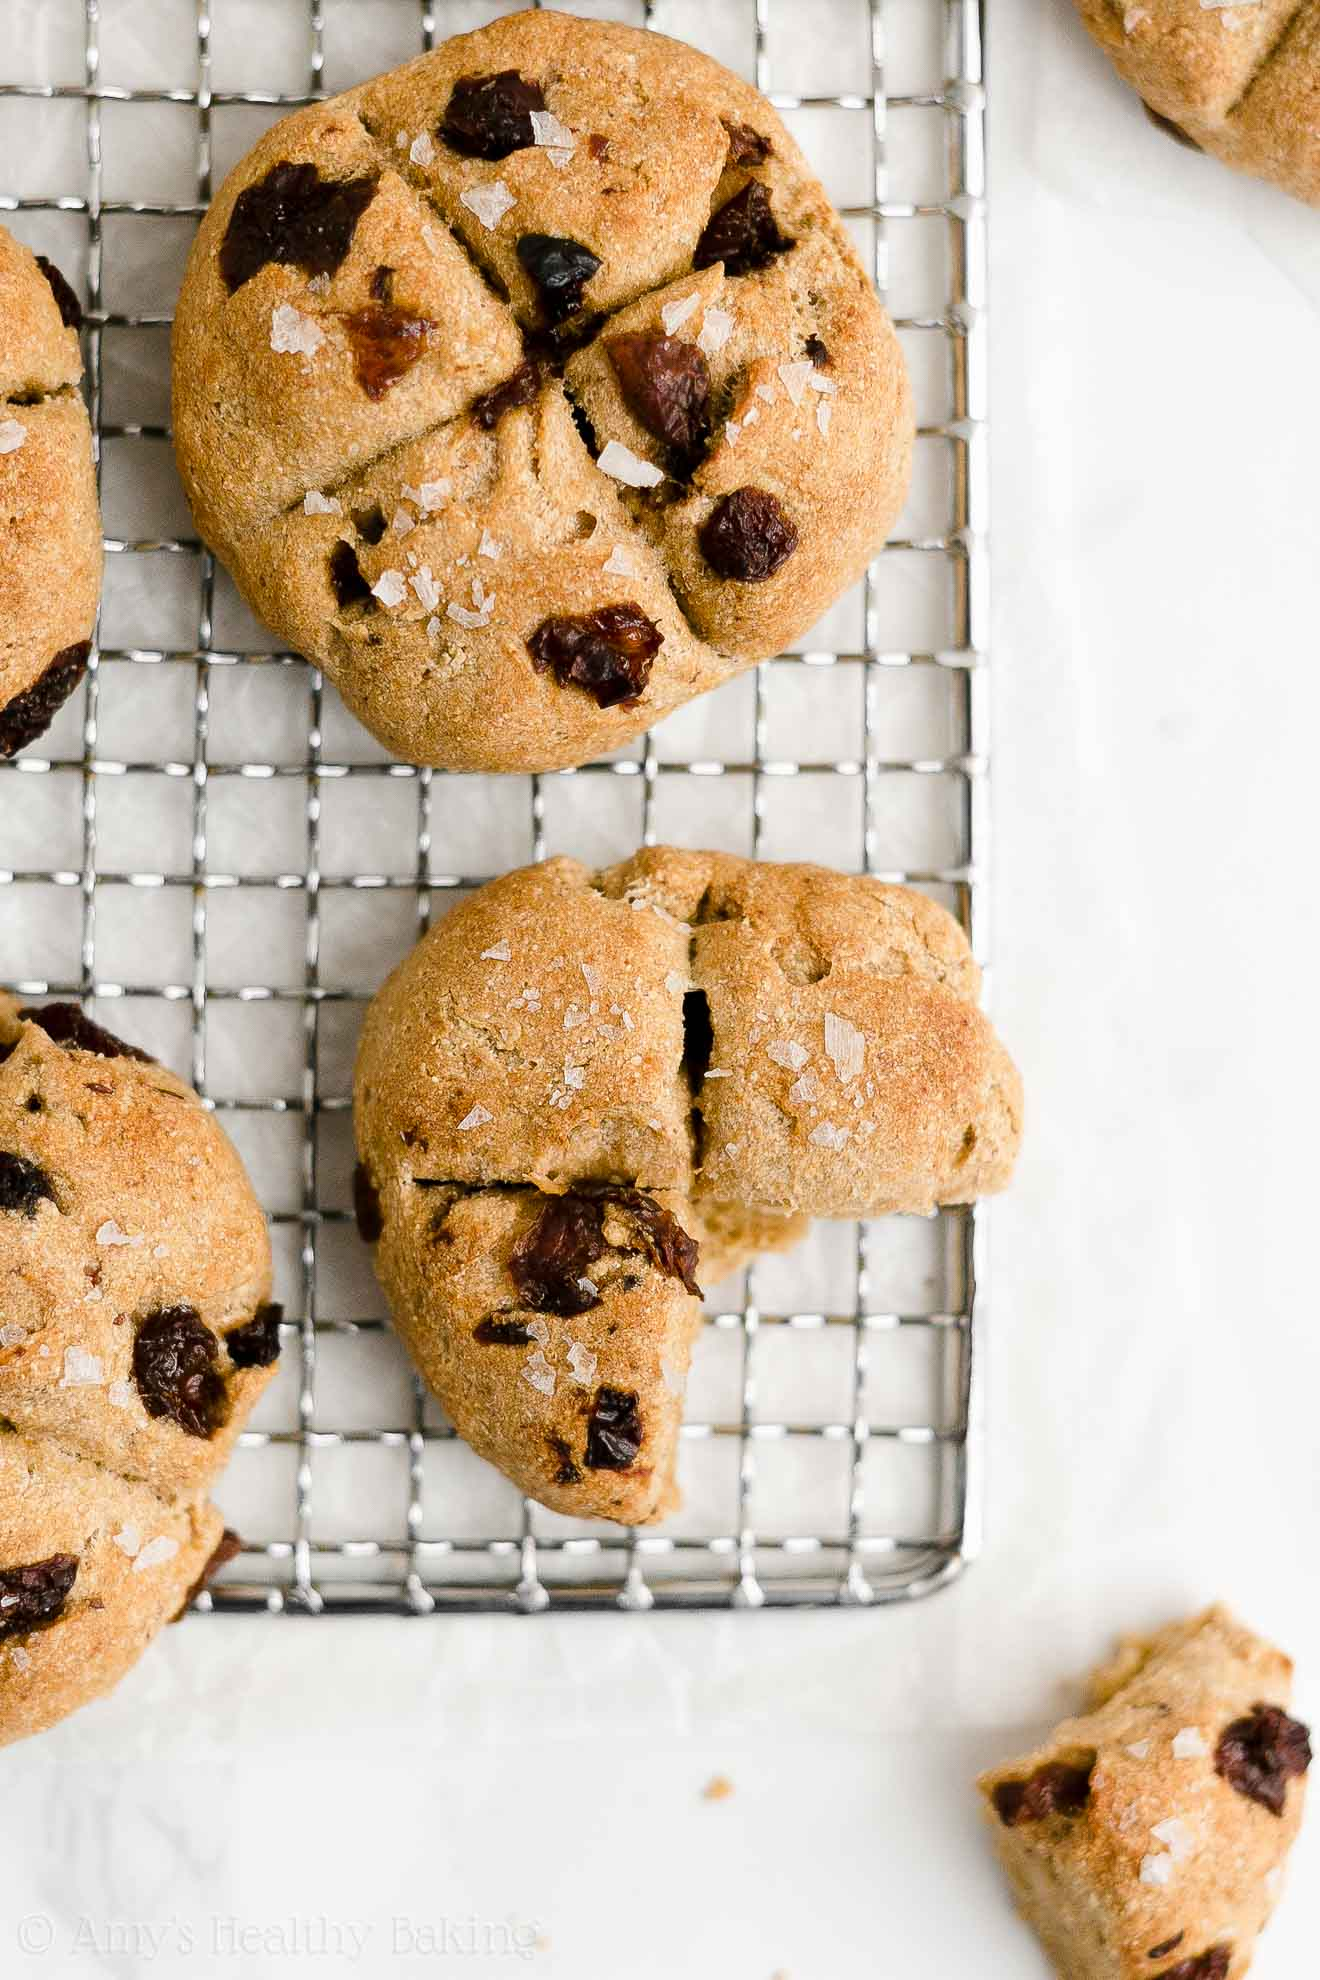 Easy Healthy Low Calorie Whole Wheat Vegan Raisin Irish Soda Bread Scones